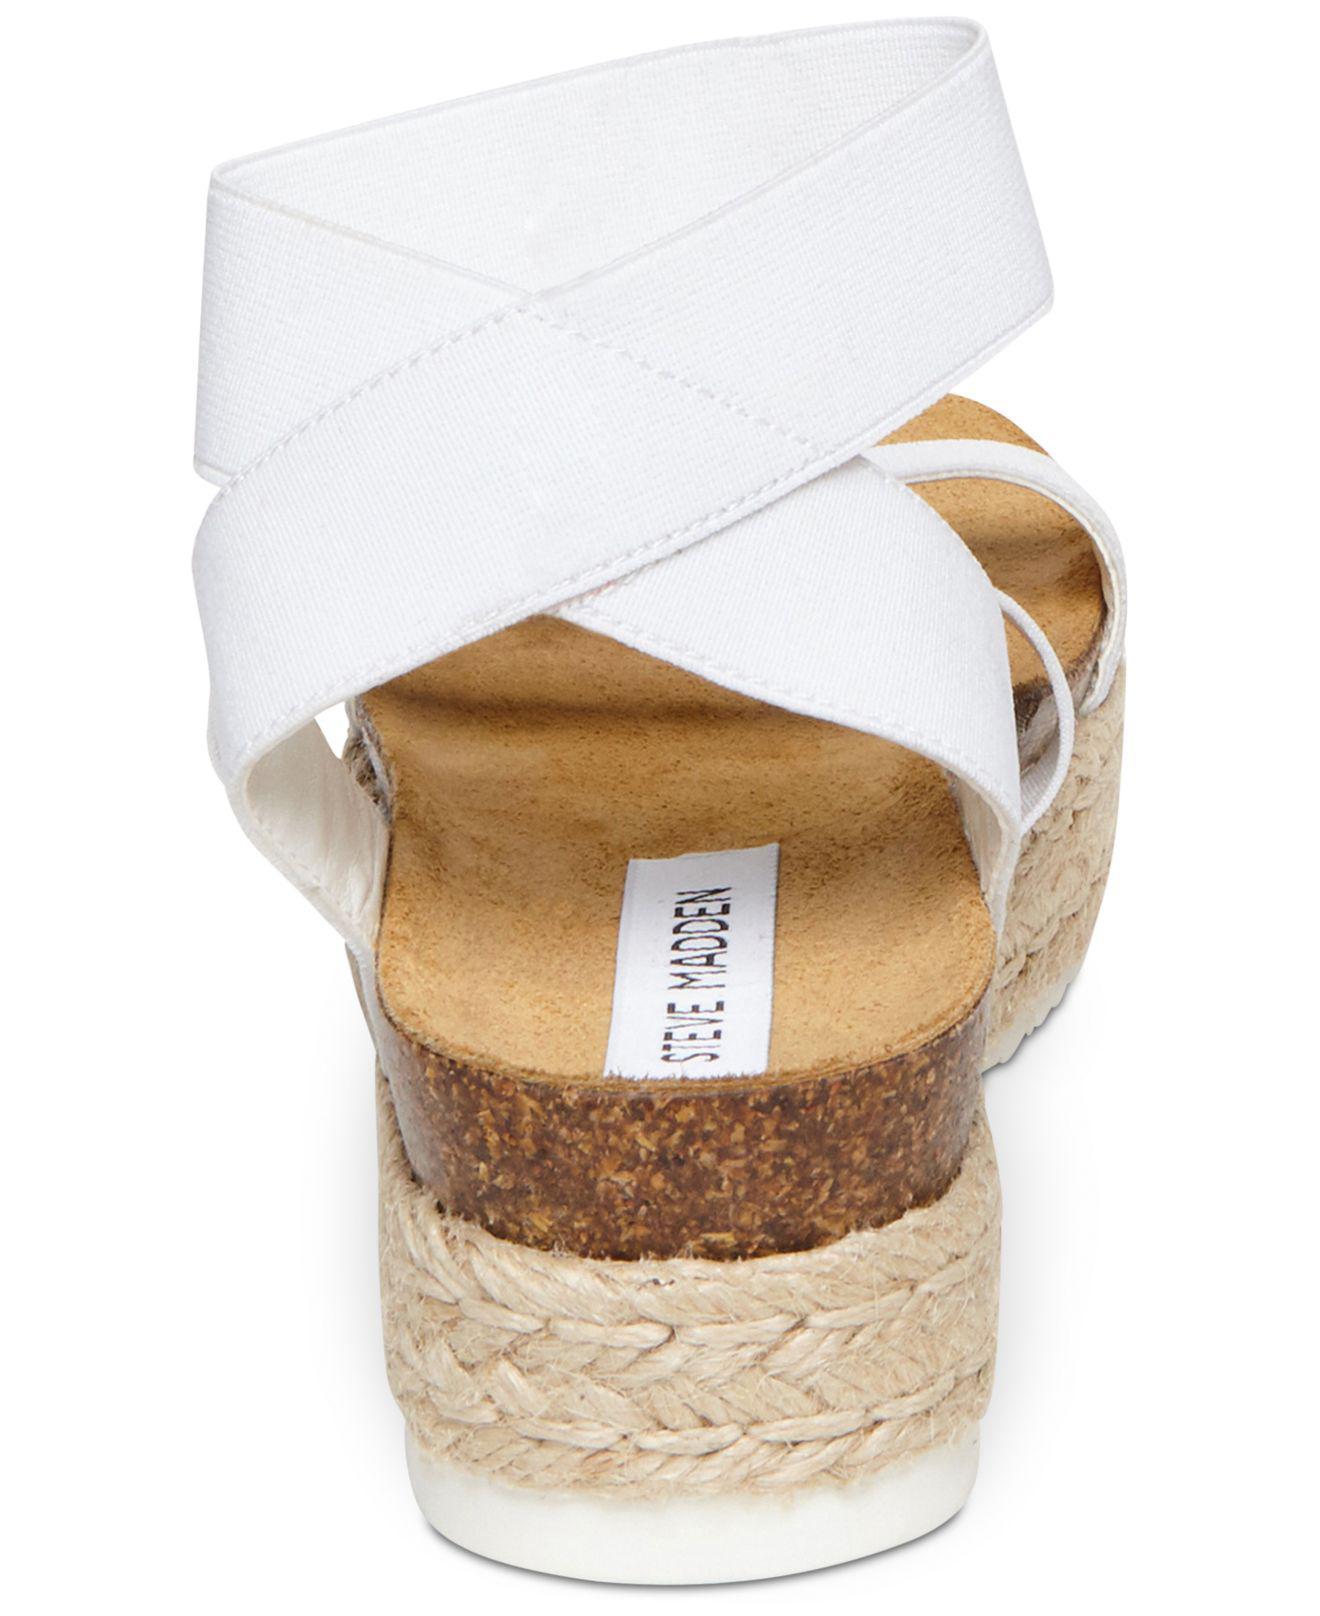 ffe61549e09 Steve Madden - White Kimmie Flatform Espadrille Sandals - Lyst. View  fullscreen